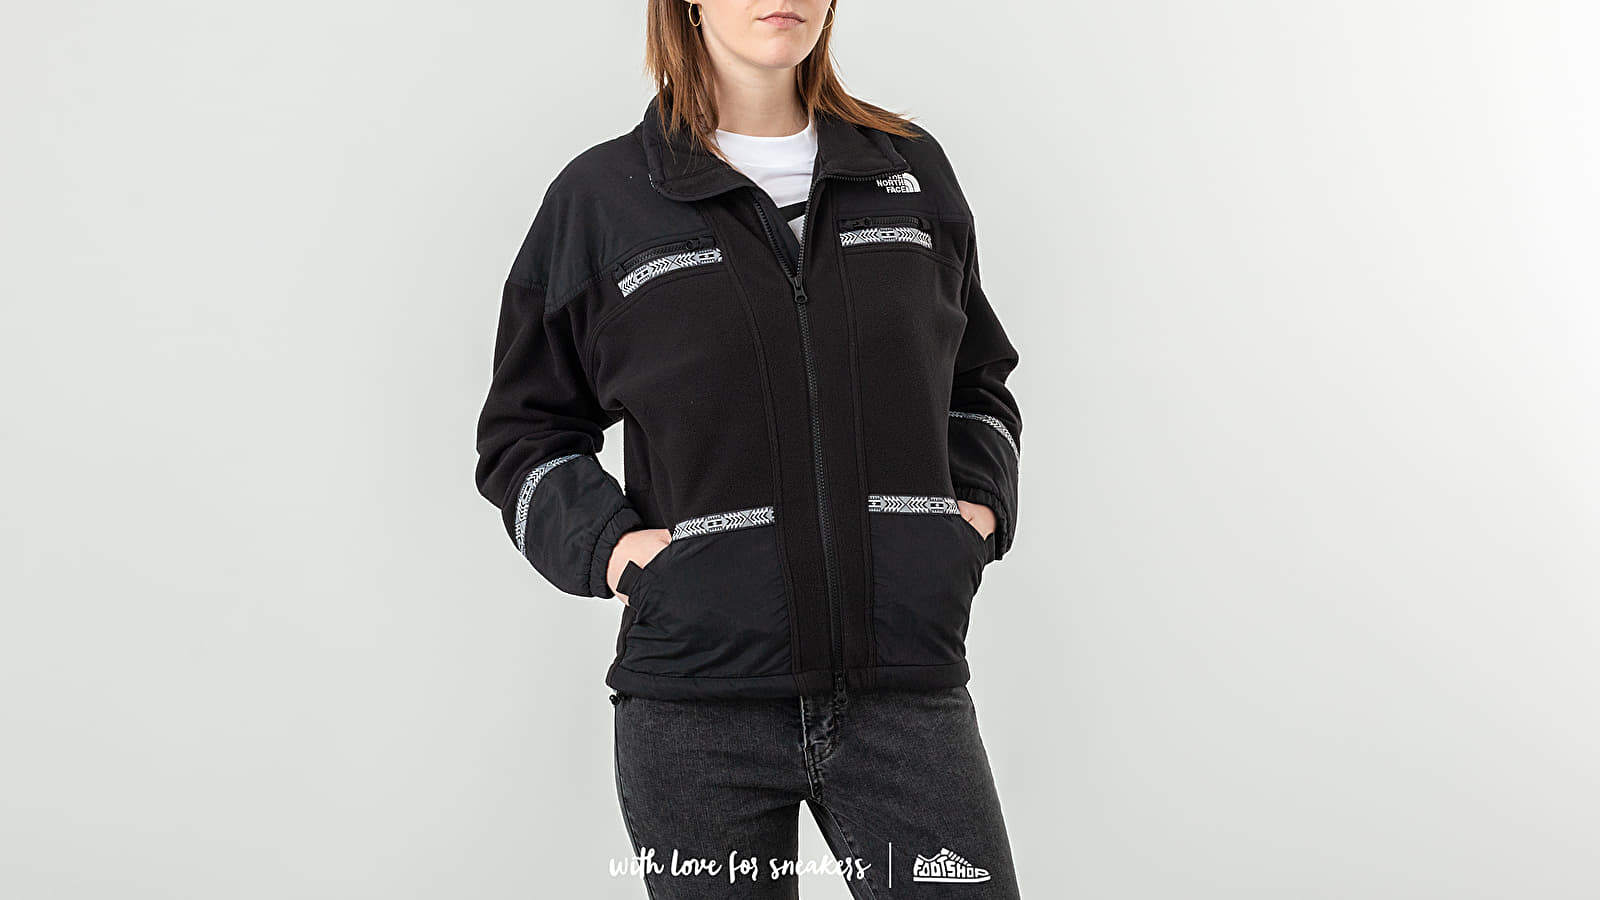 The North Face '92 Retro Rage Fleece Zip Tnf Black za skvelú cenu 111 € kúpite na Footshop.sk